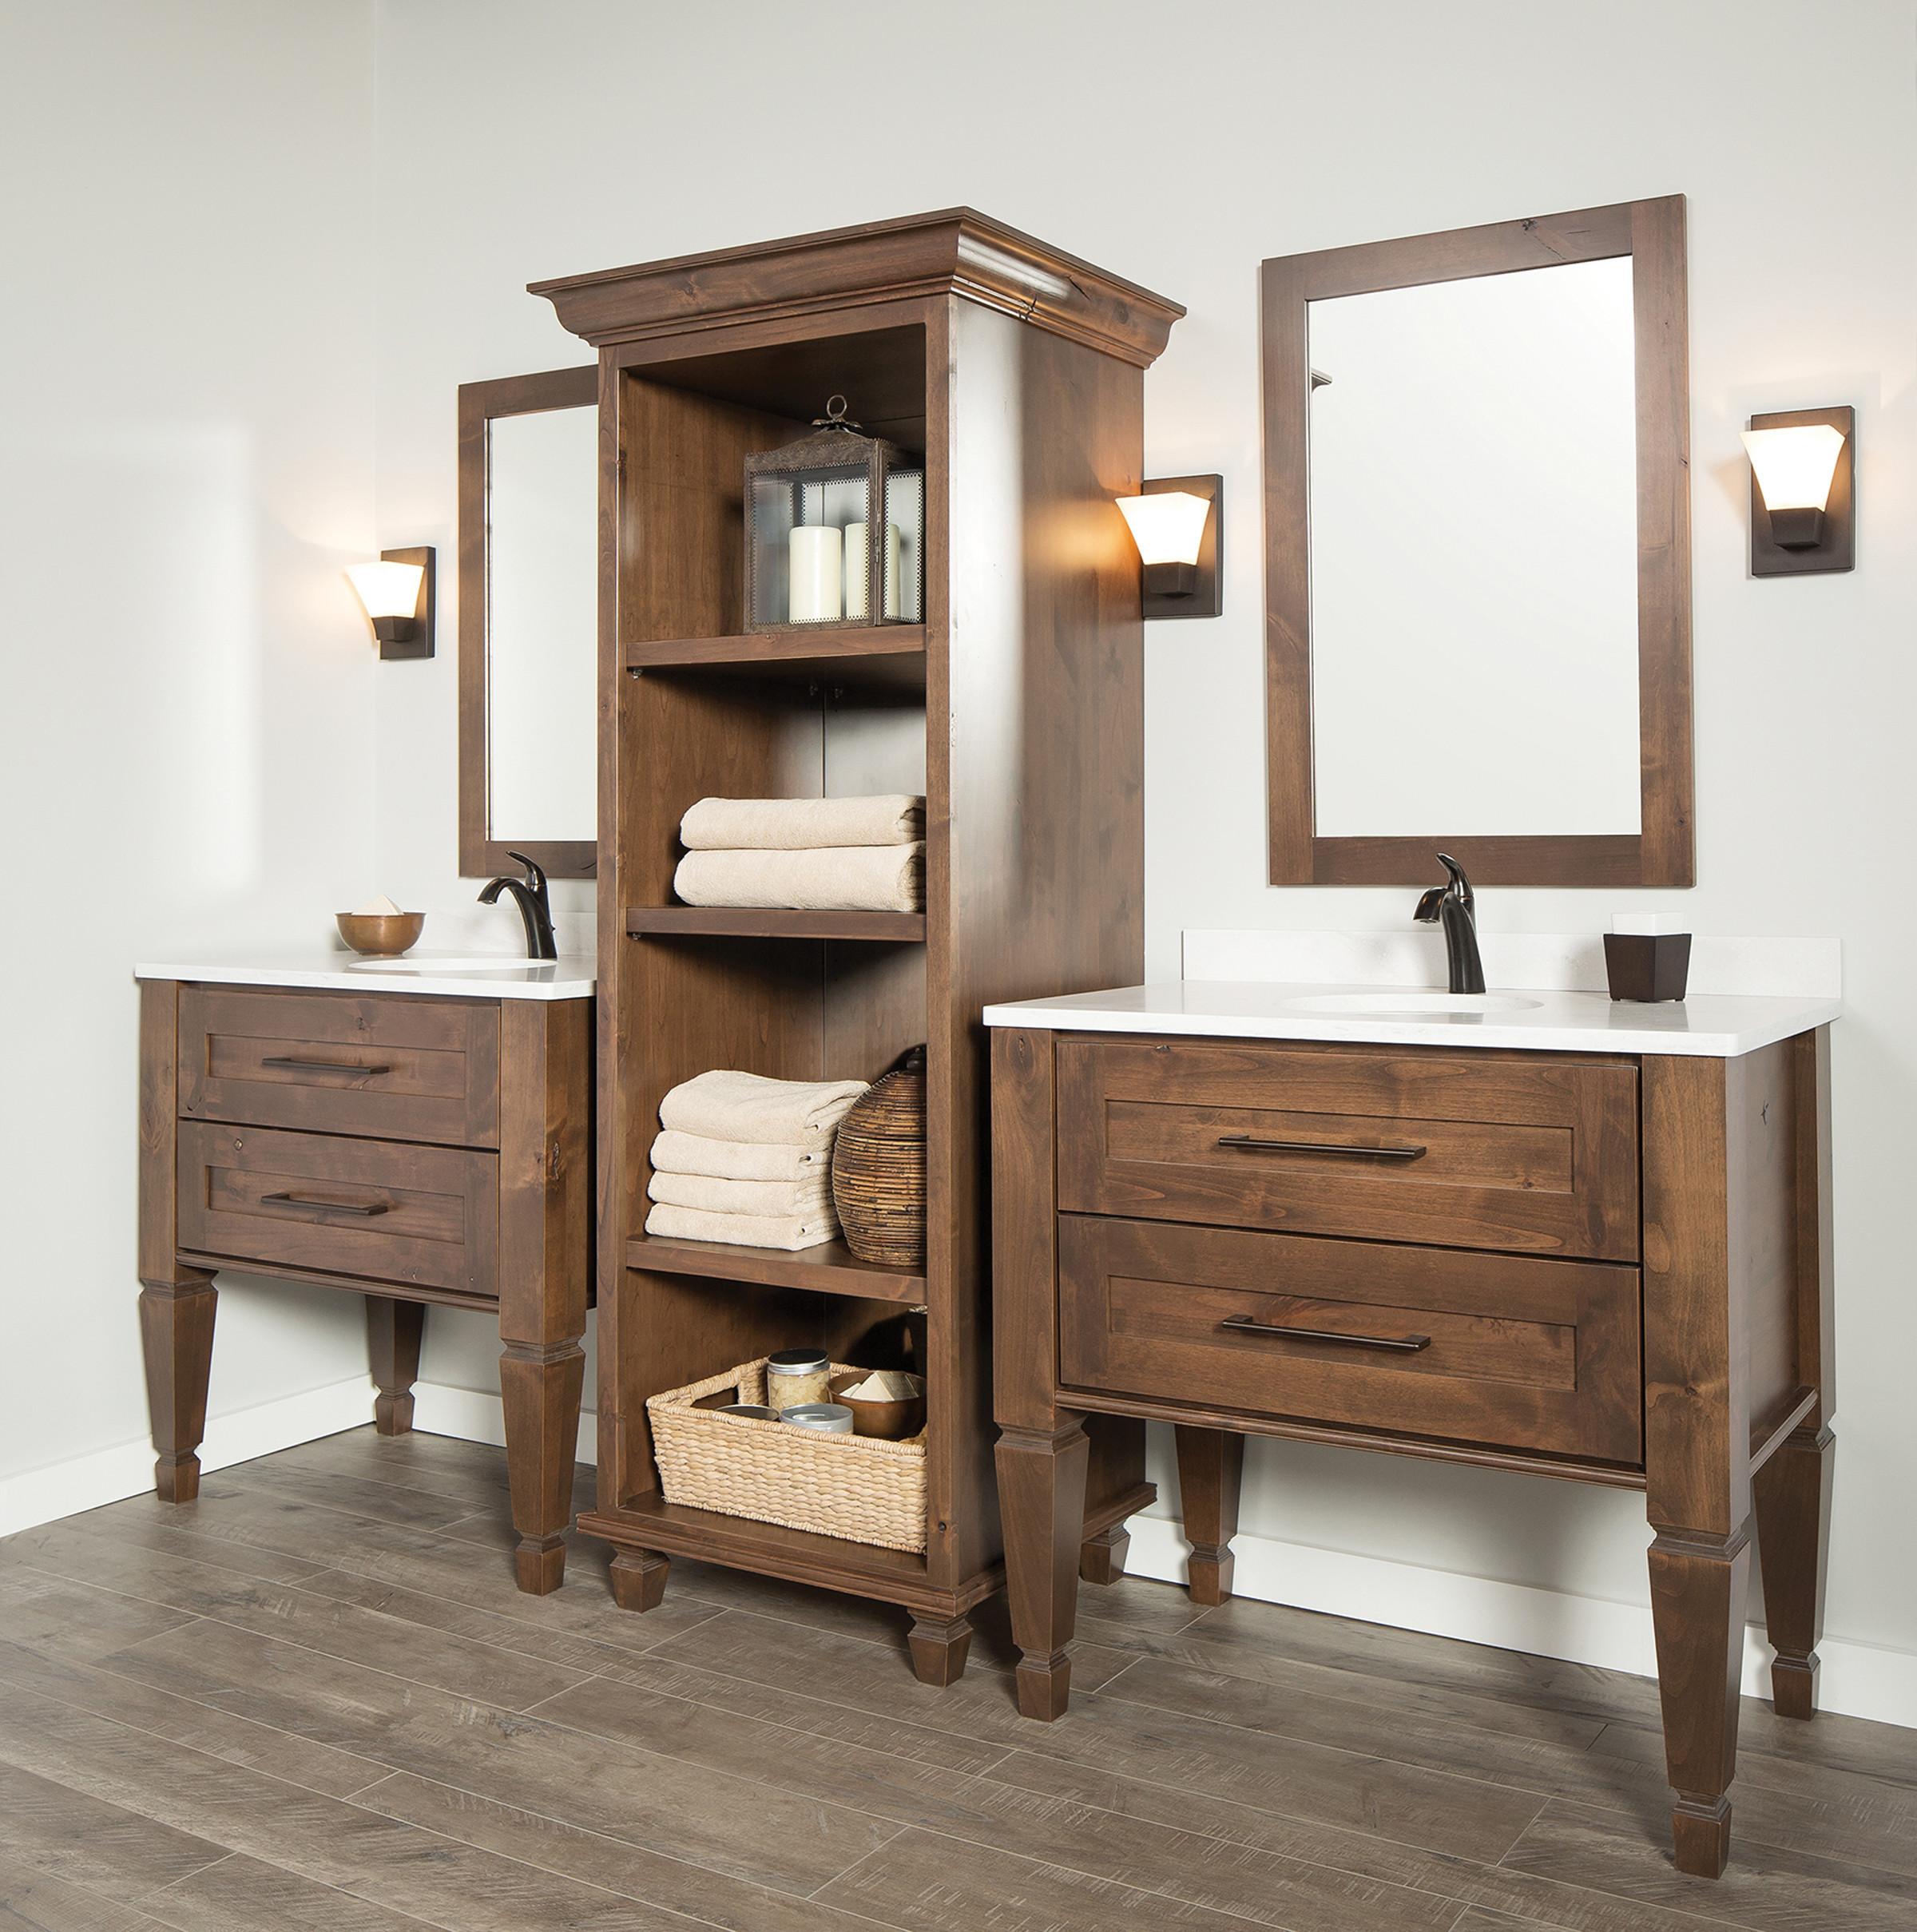 Furniture Style Bathroom Vanities Ideas Photos Houzz